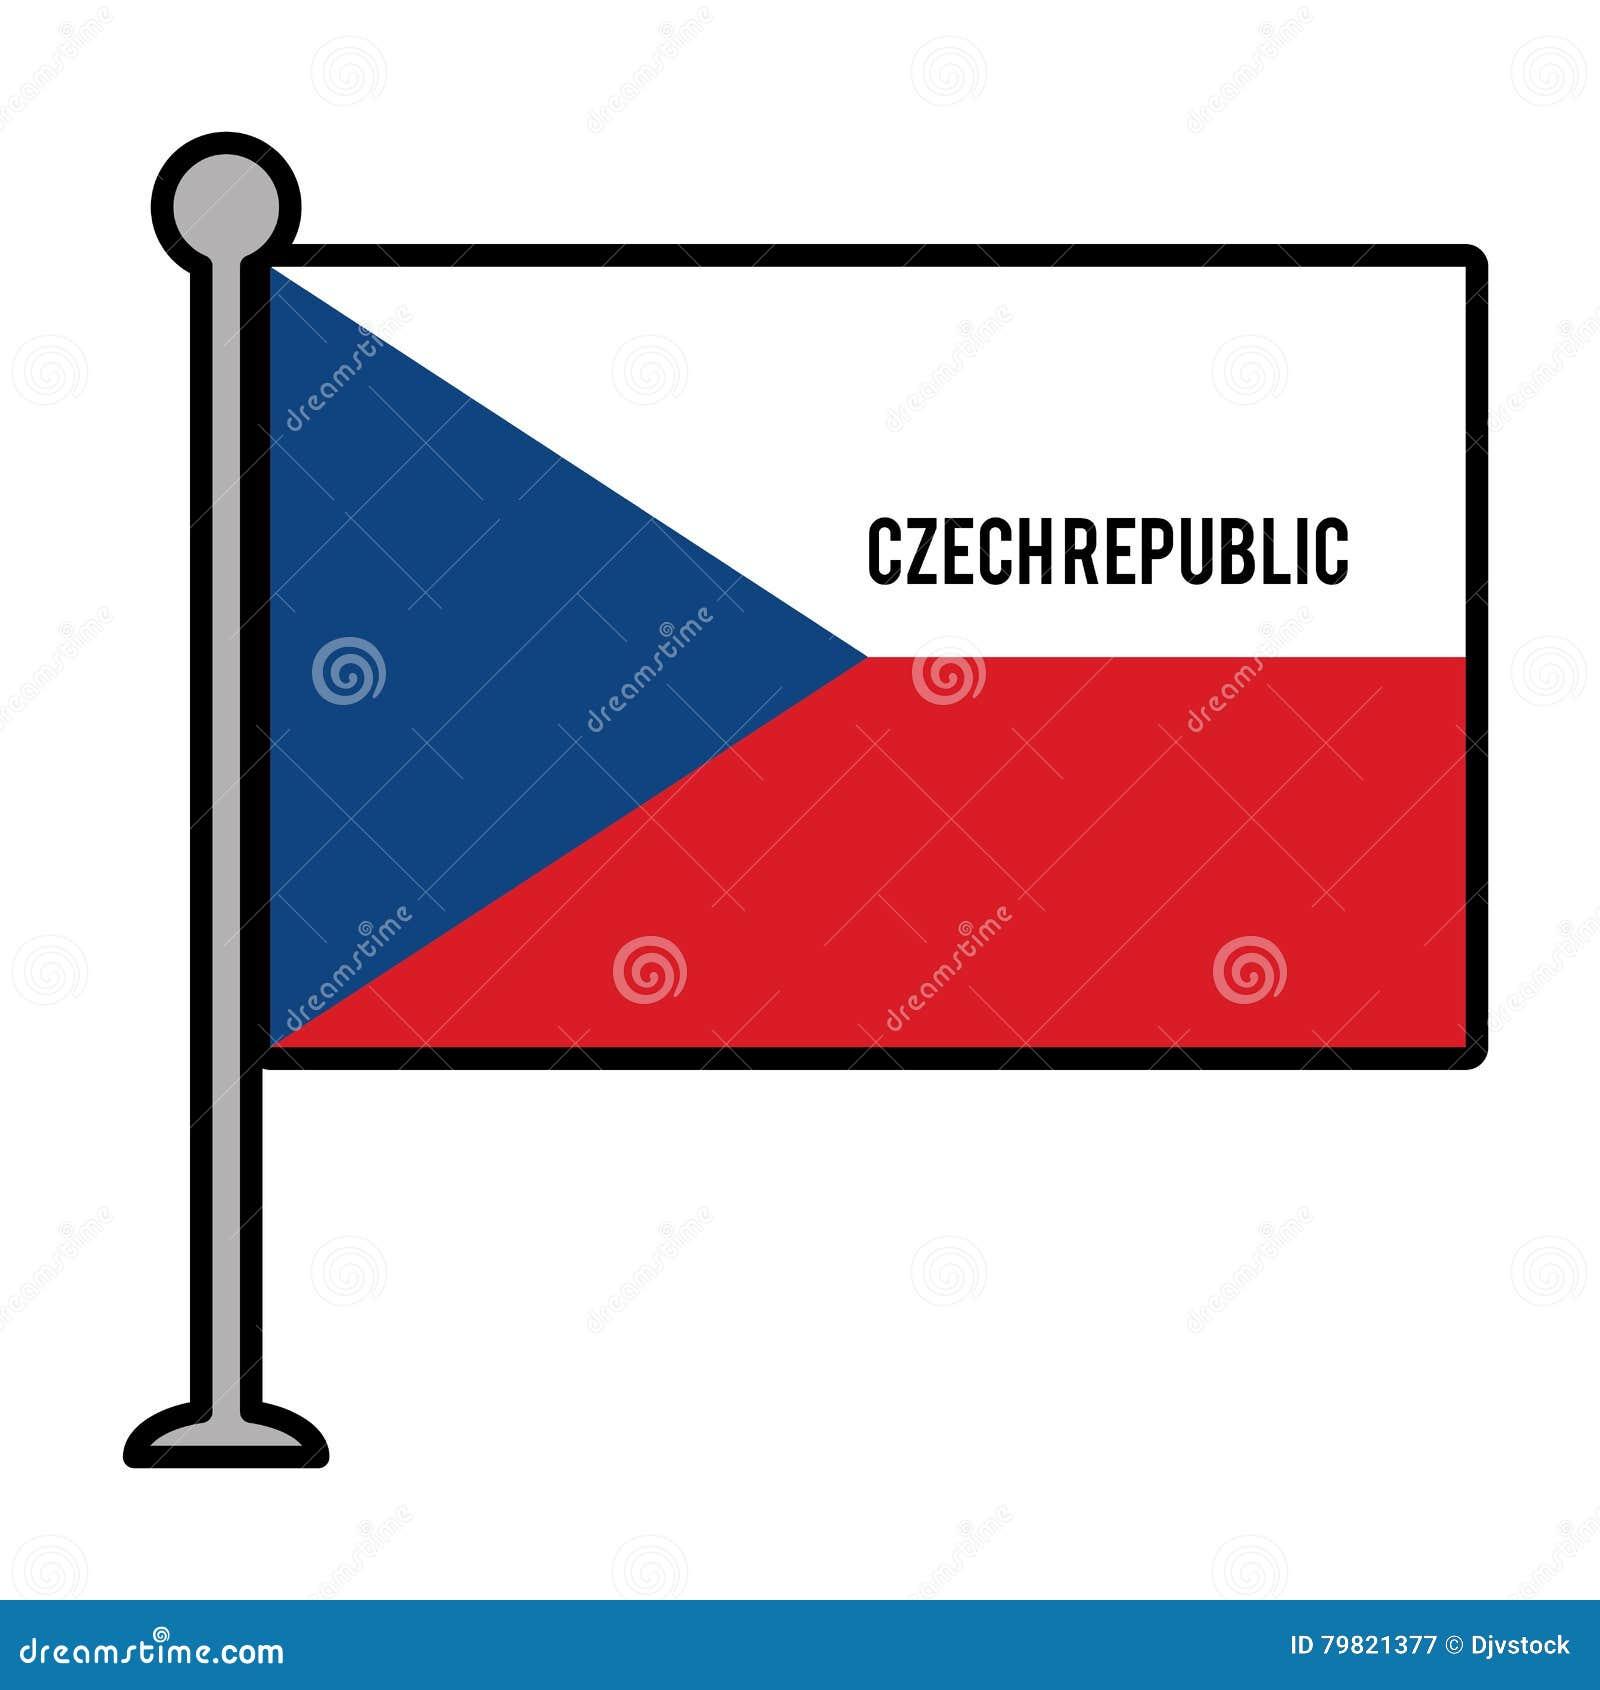 Republic cartoons illustrations vector stock images for Designhotel elephant prague 1 czech republic